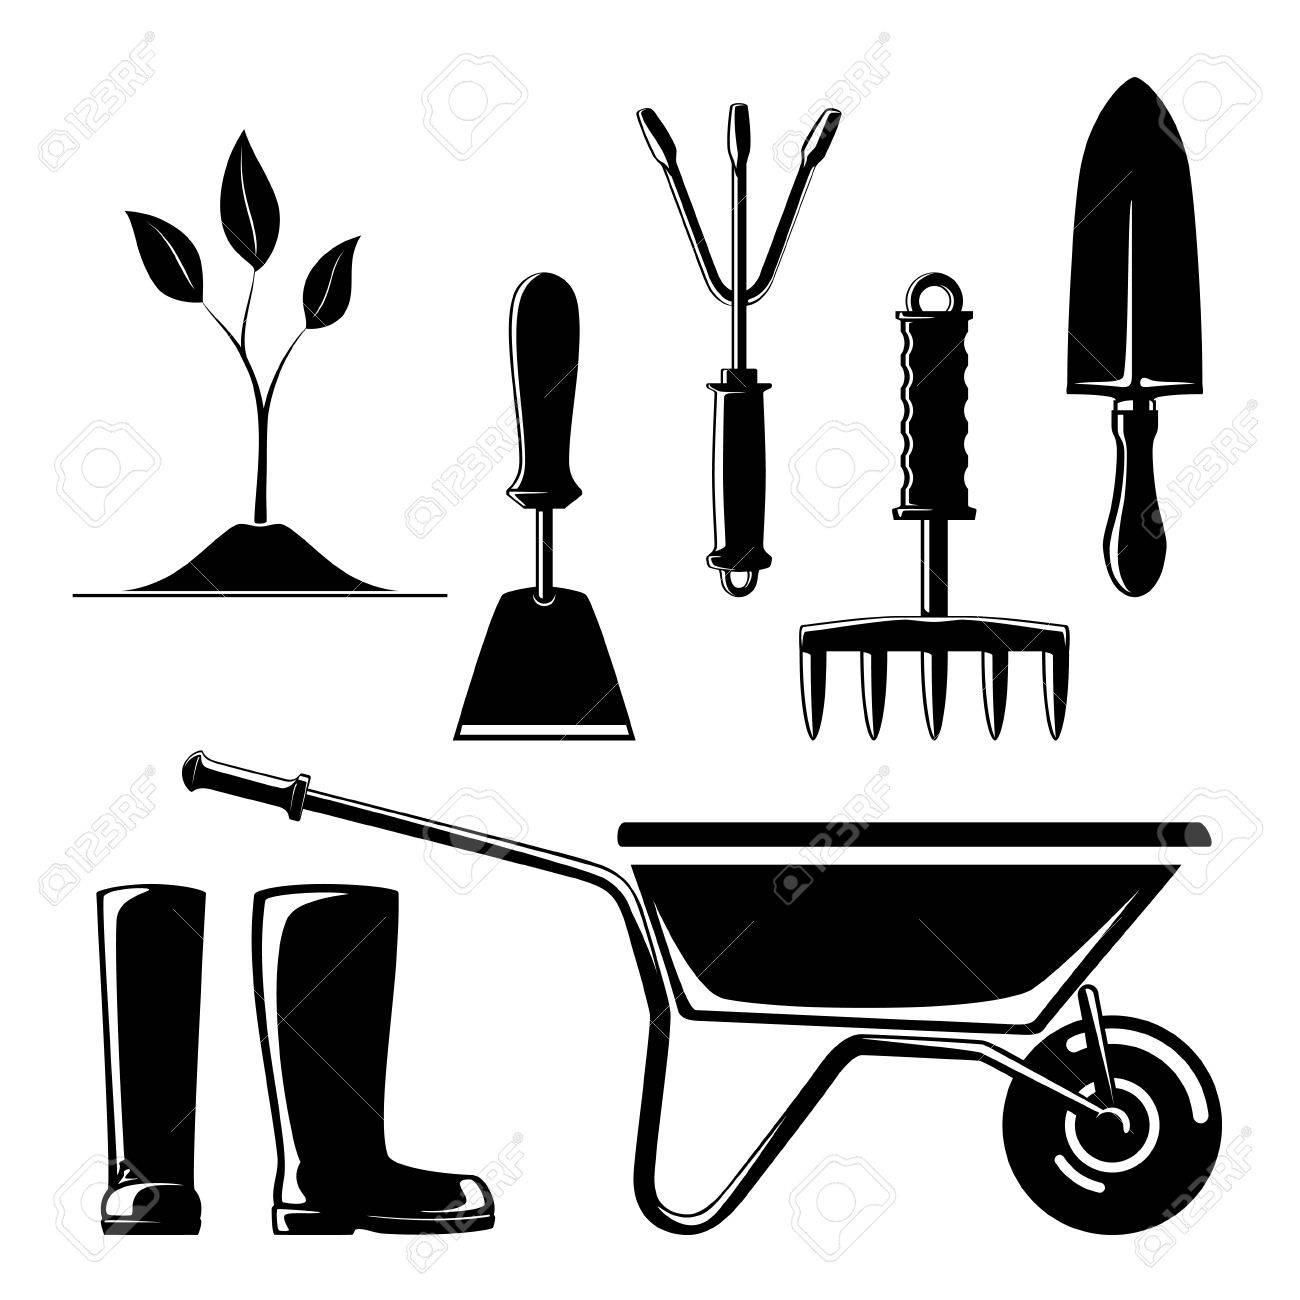 1300x1300 Equipment, Scythe, Gardening, Agriculture, Garden, Farm, Tools